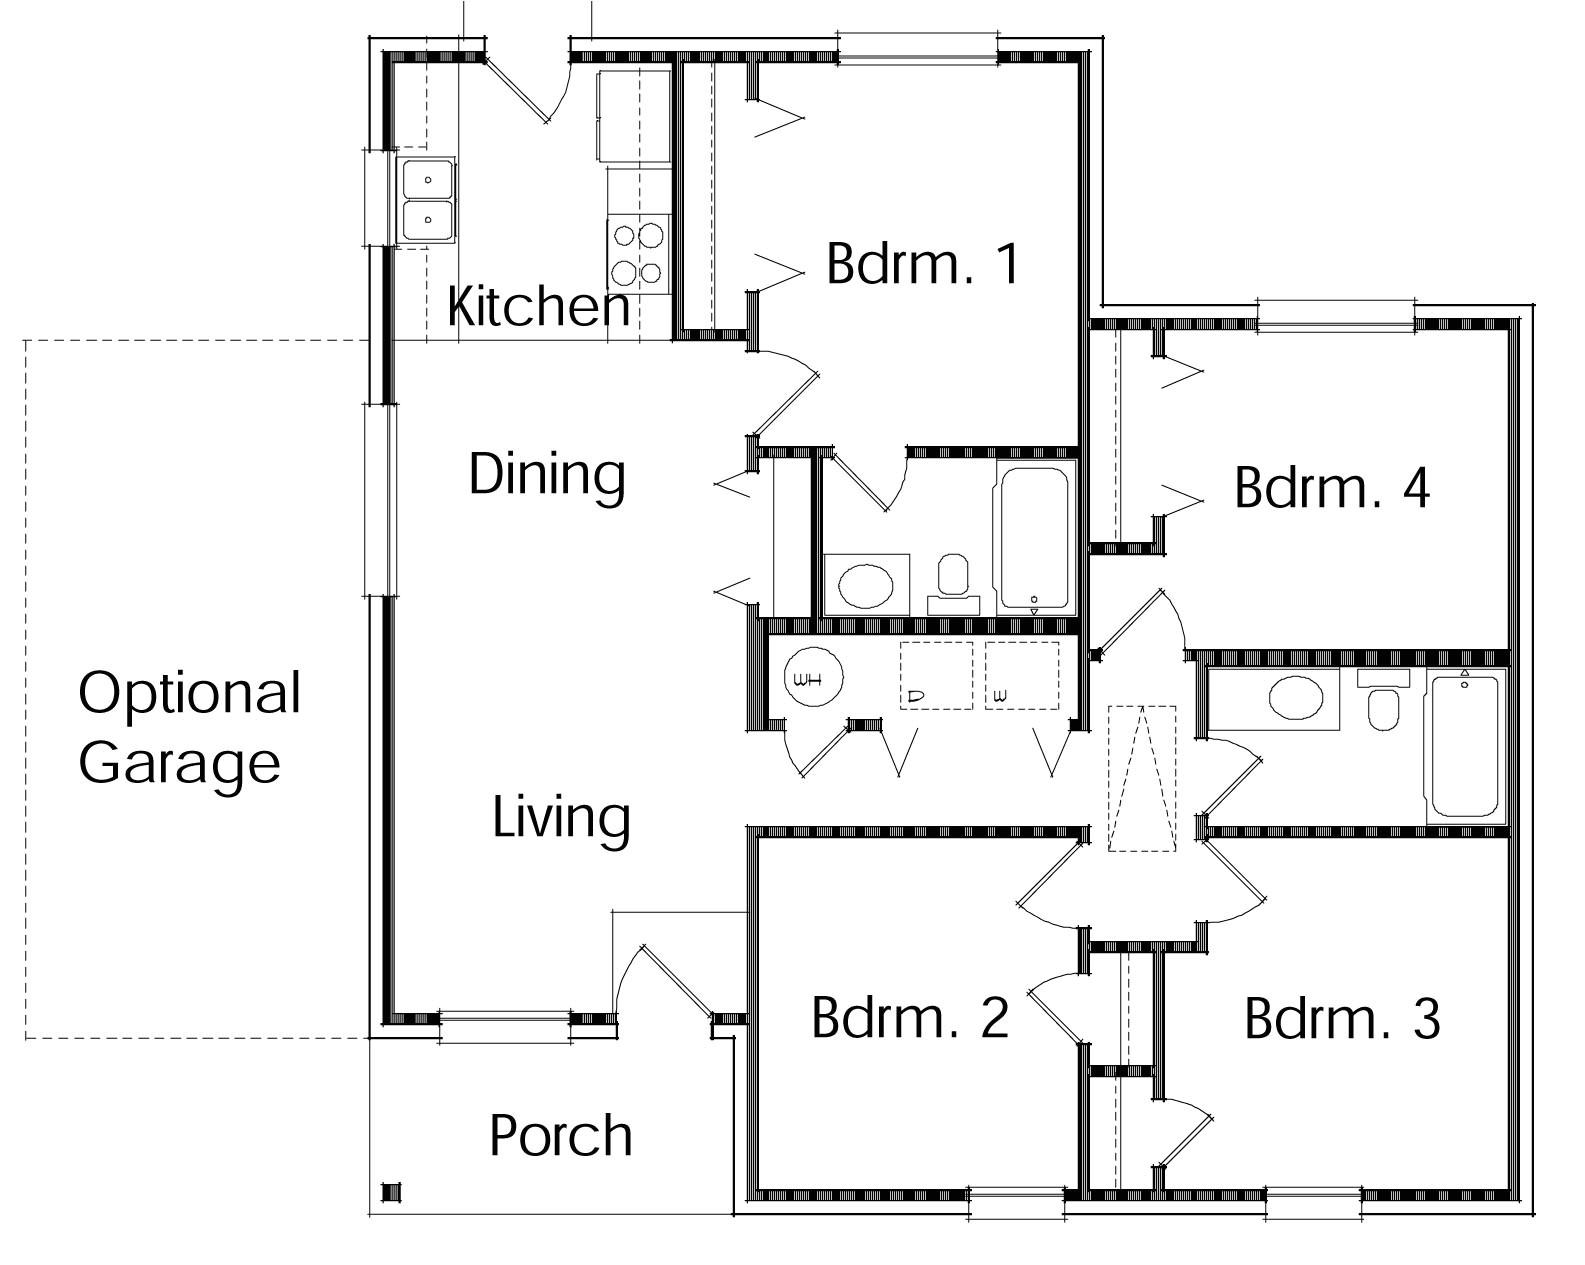 Home Plans Pdf Free House Plans and Designs Pdf